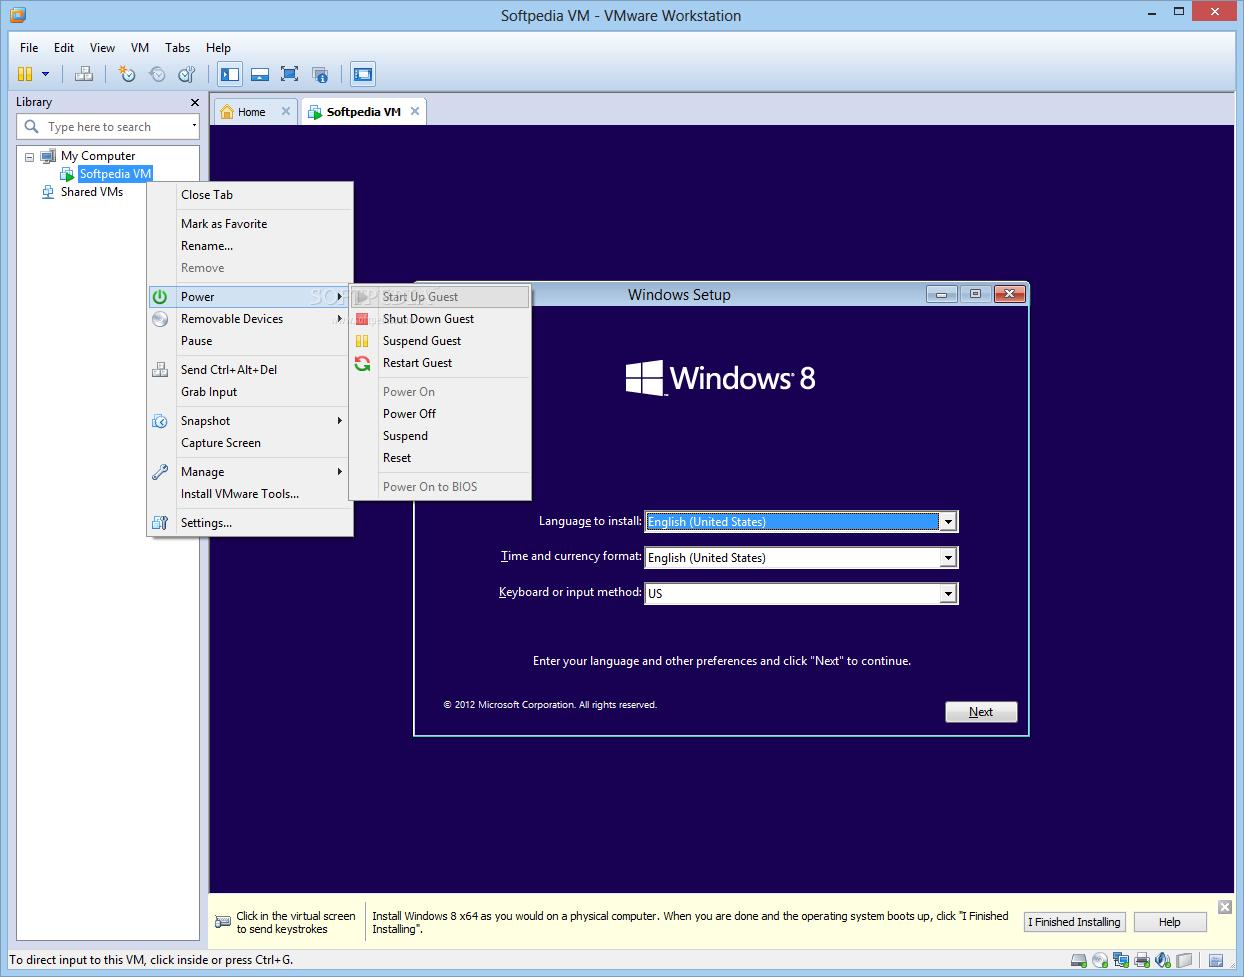 Free Download Software vmware Workstation 11 Final Full Serial Key Generator